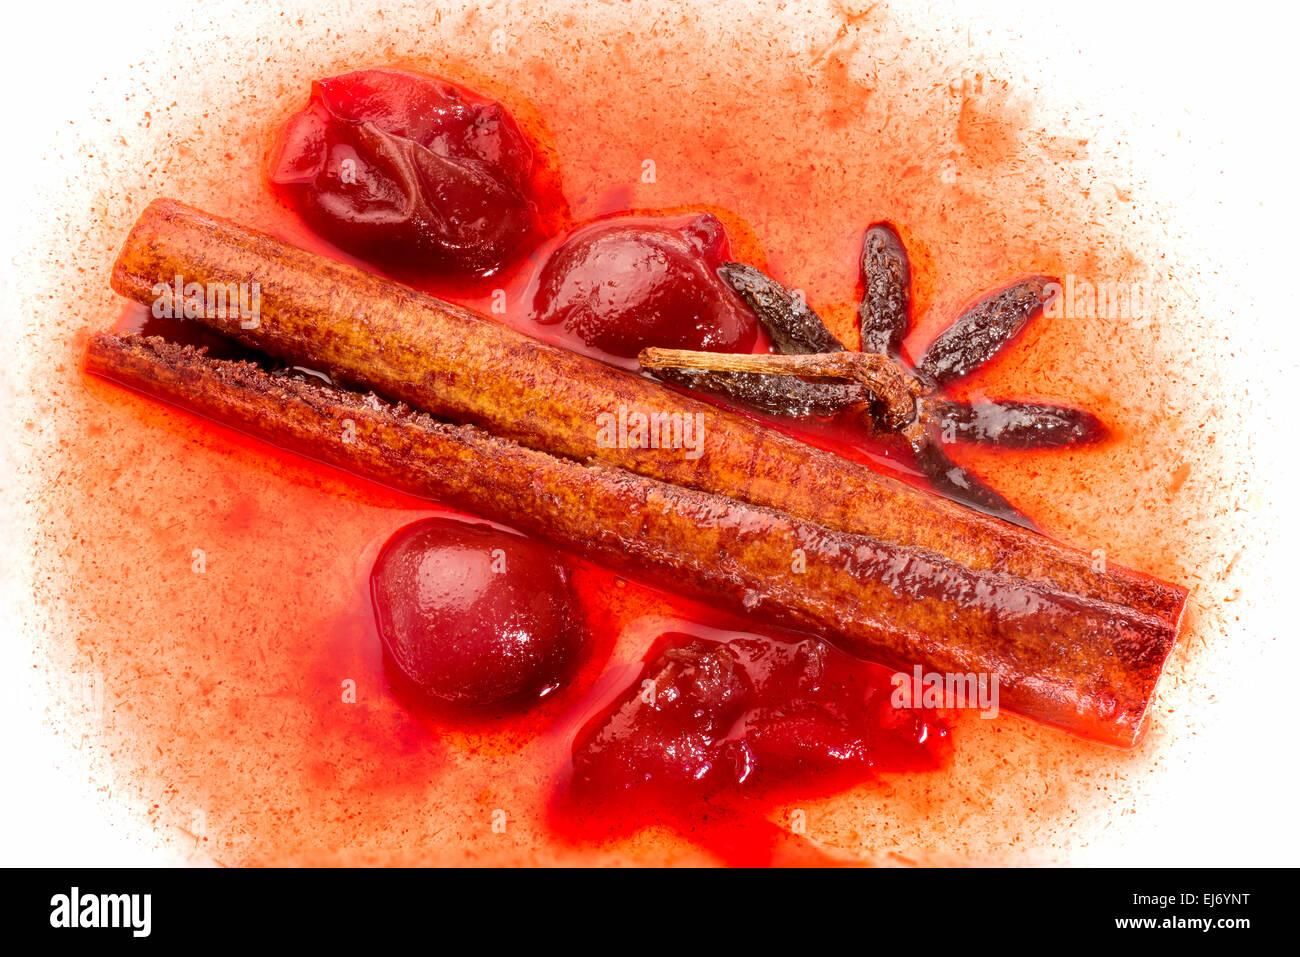 food dessert cherry cinnamon star anise smell taste sweet dessert compote translucent cinnamon stick completely - Stock Image